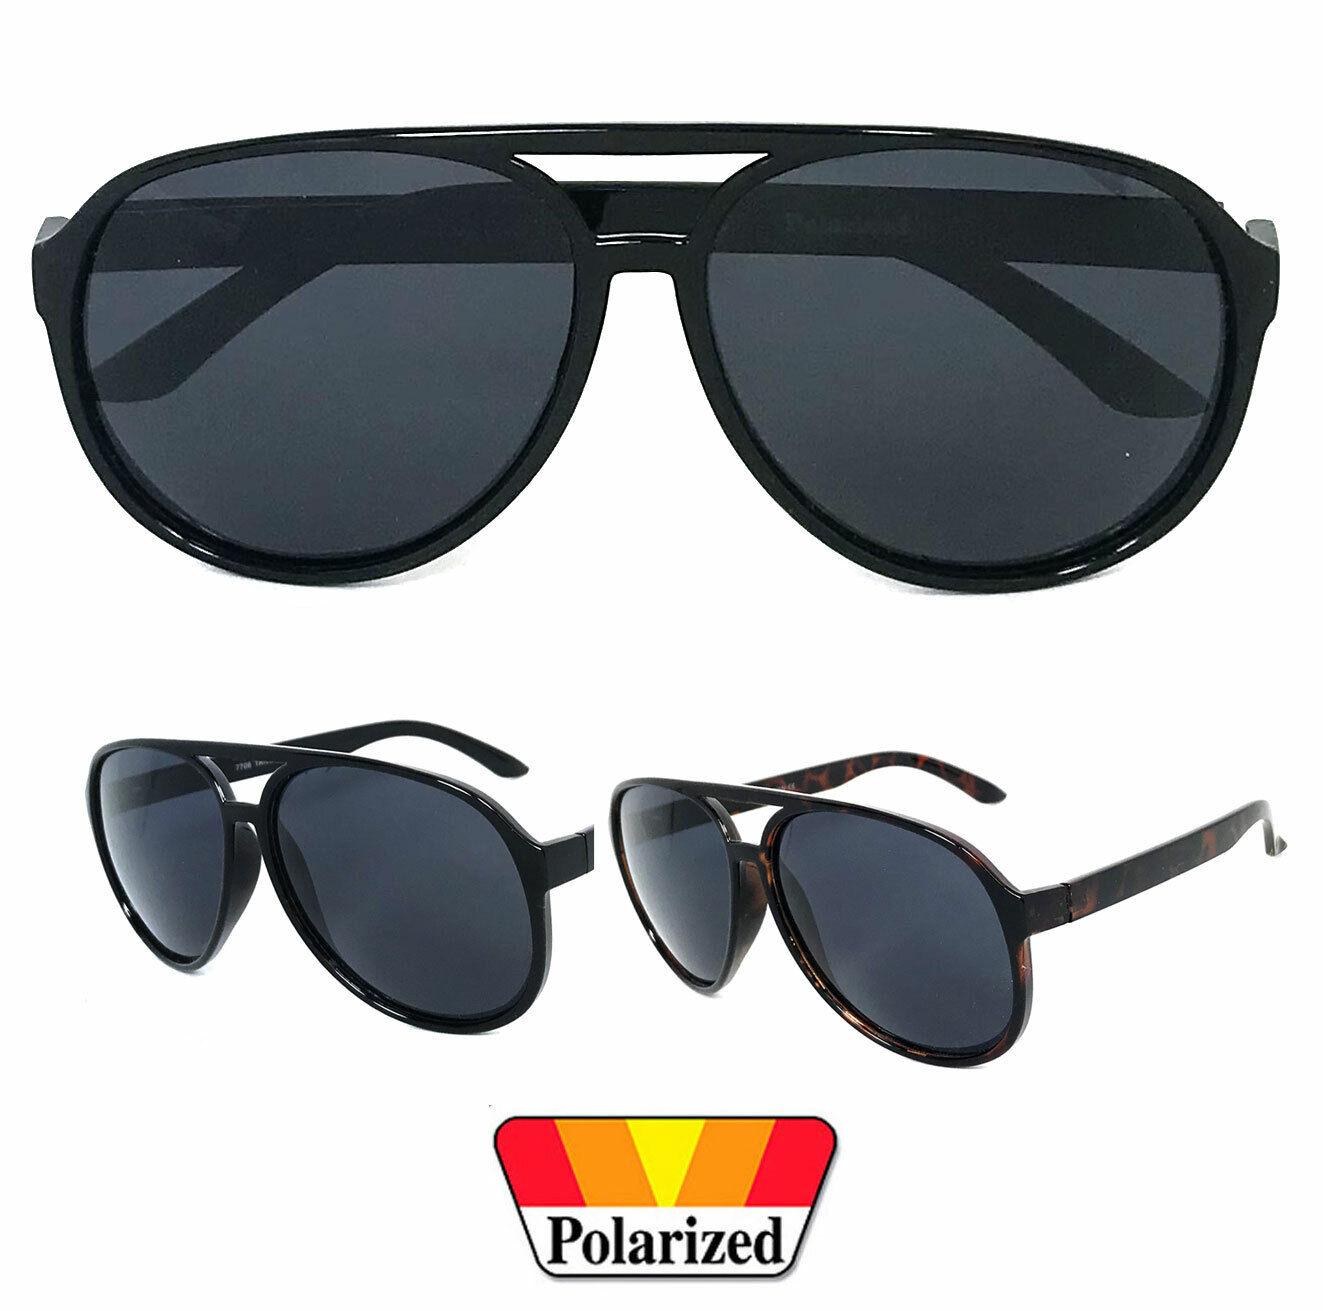 1 Oder 2 Paar 80s Polarisiert Groß Pilot Retro Sonnenbrille SPORTS Fahren Dunkel